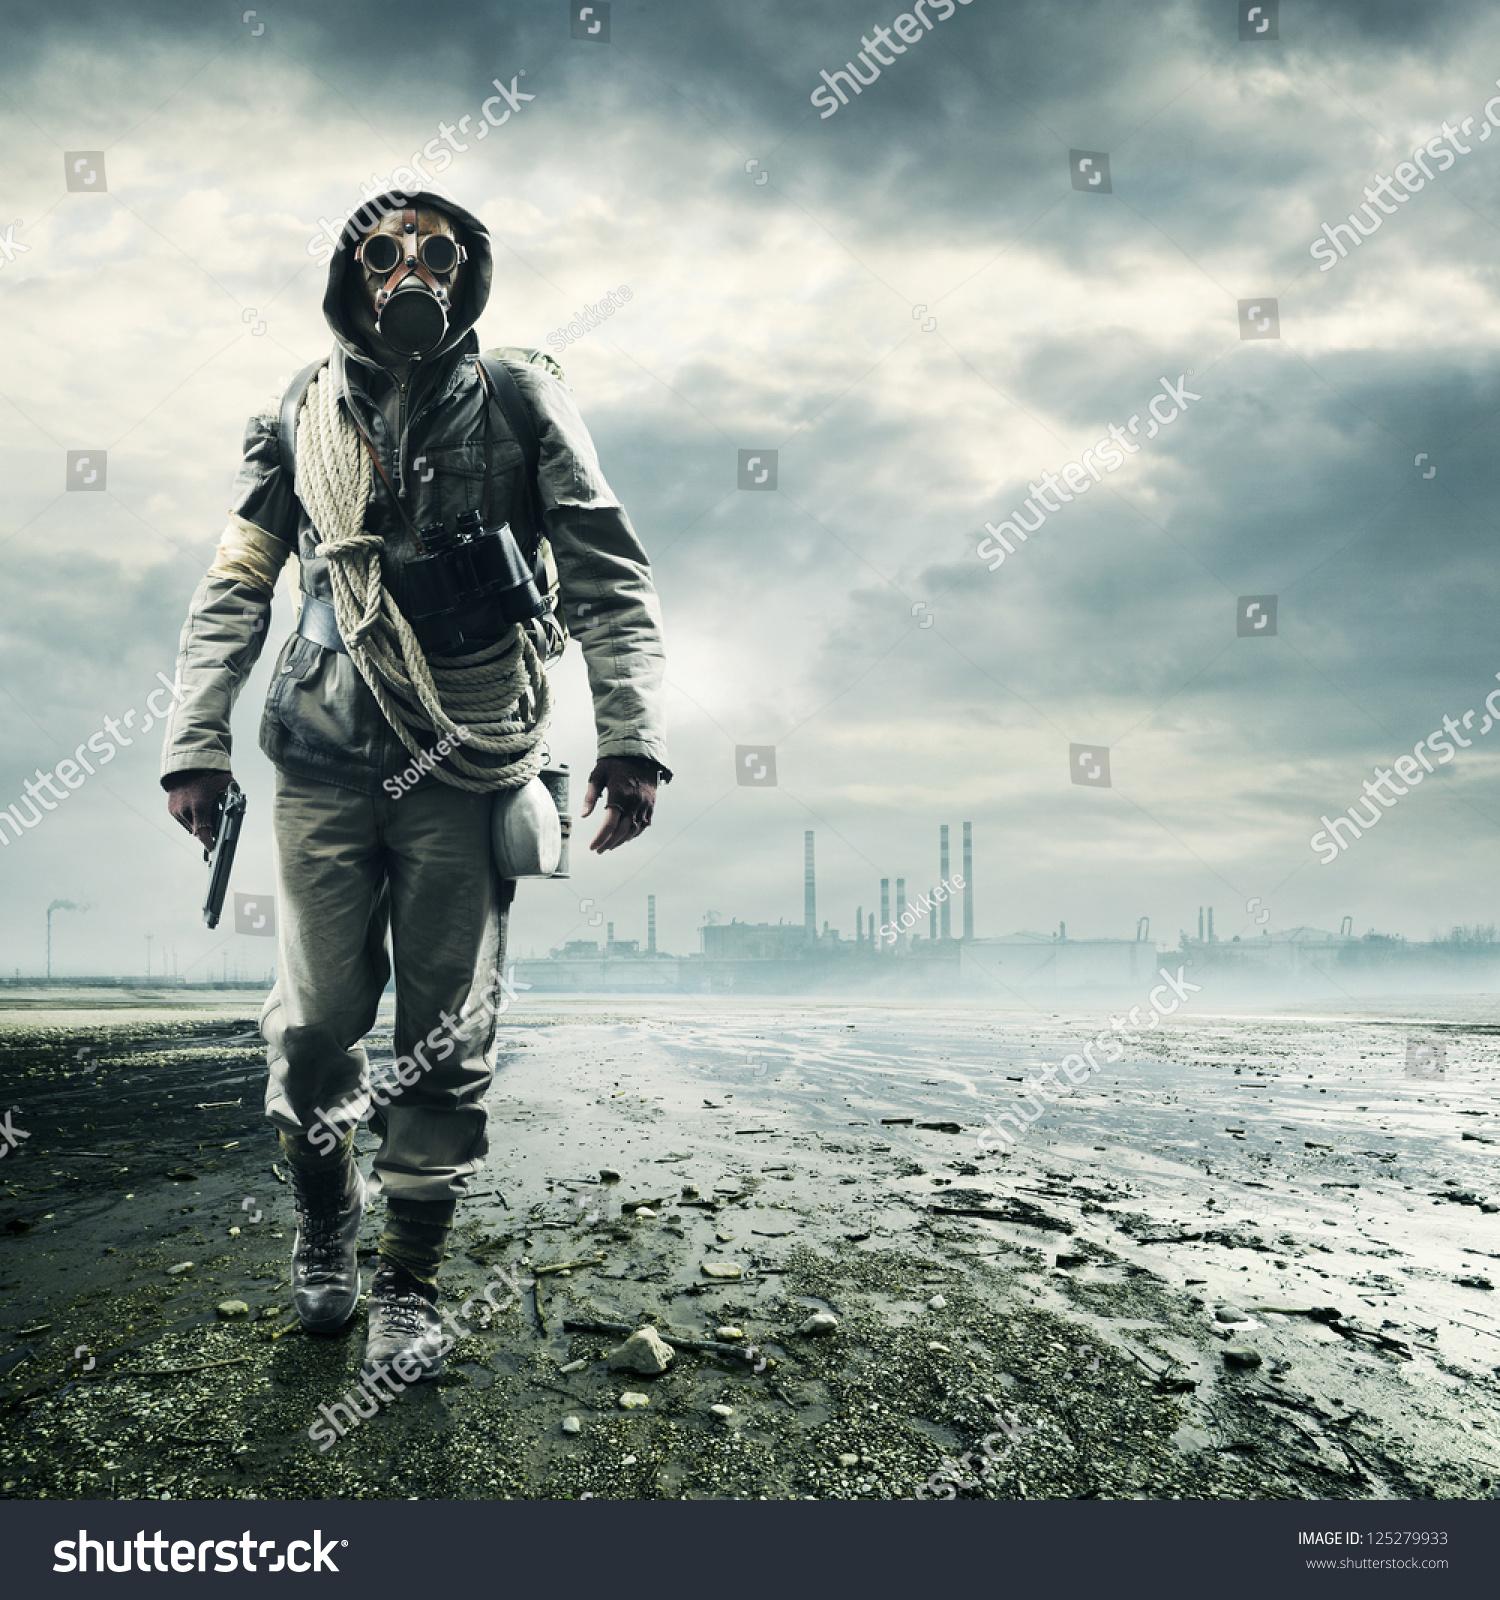 Apocalyptic Soldier Pics: Environmental Disaster Post Apocalyptic Survivor Gas Stock